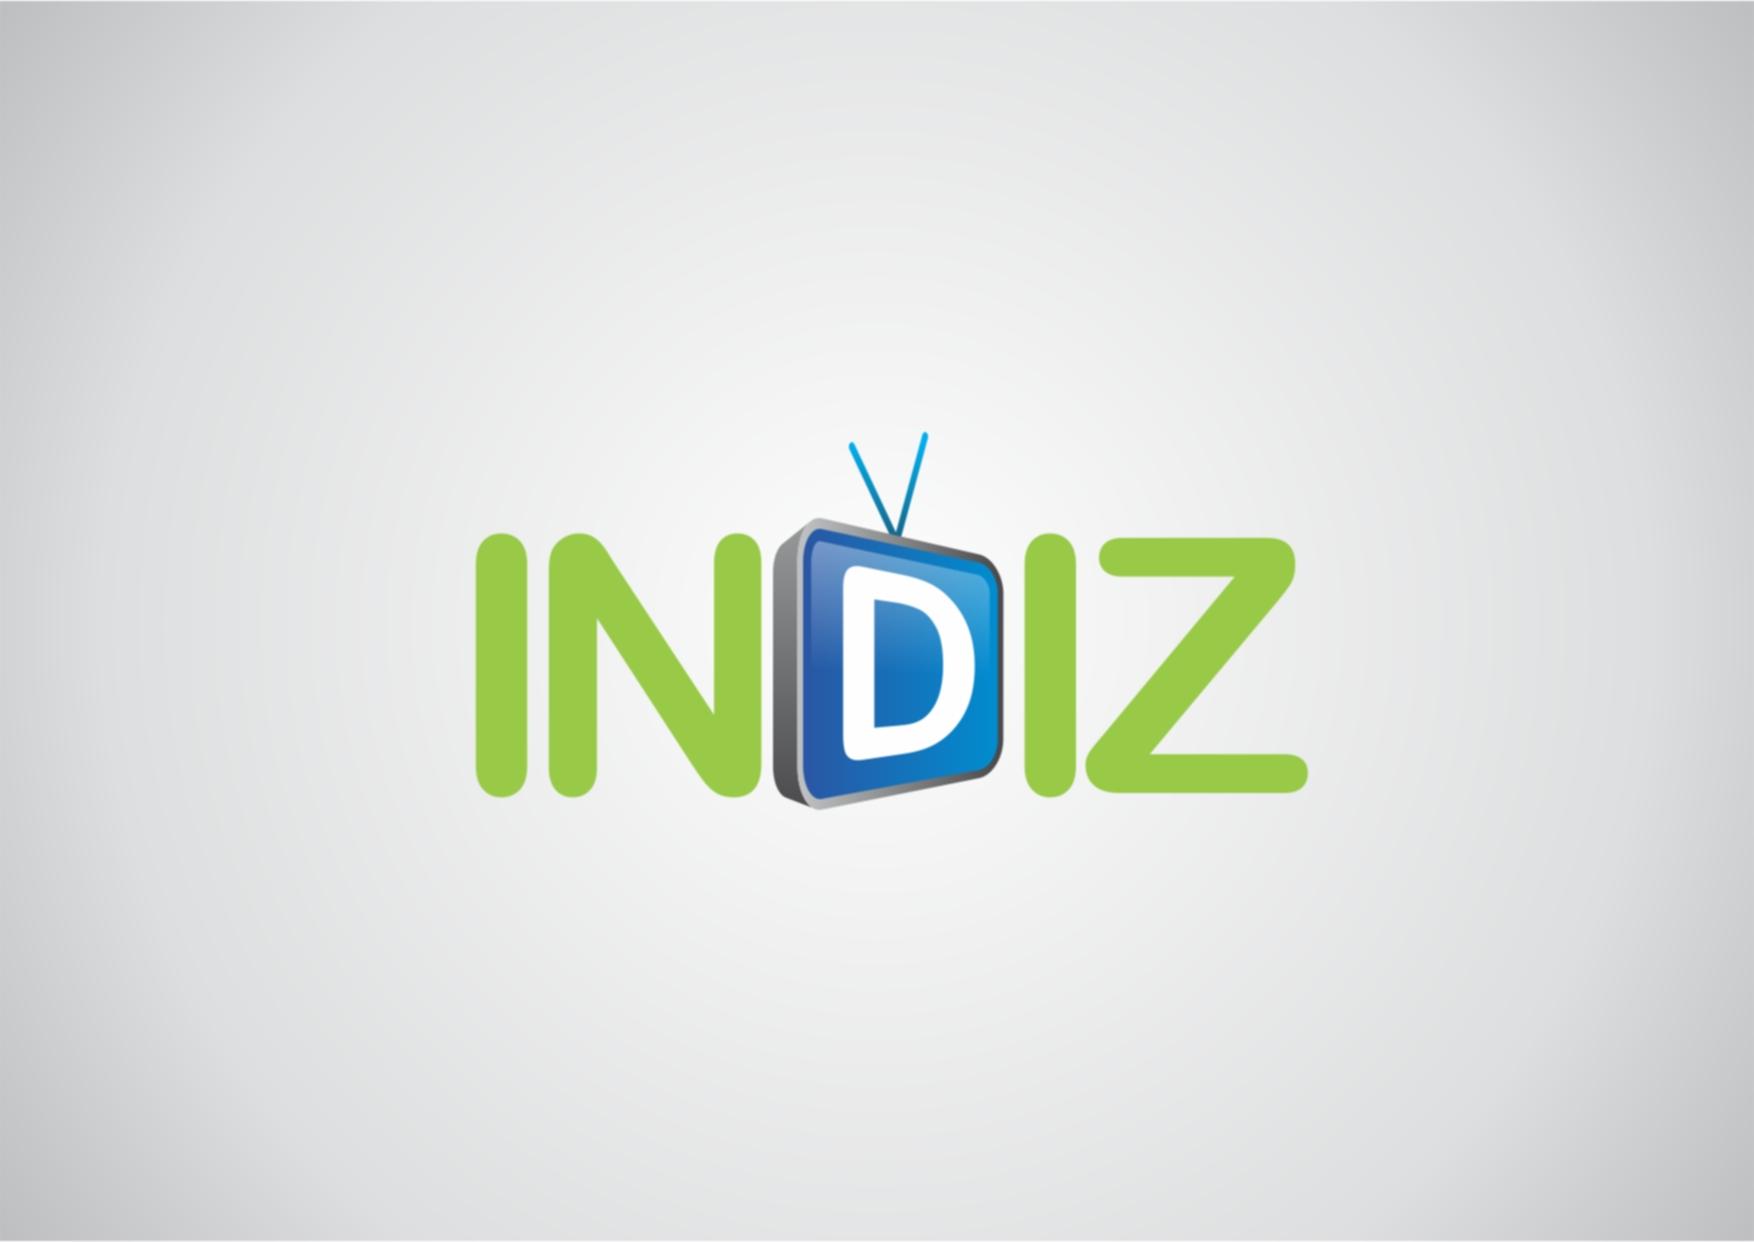 Logo Design by Private User - Entry No. 168 in the Logo Design Contest Fun Logo Design for Indiz.